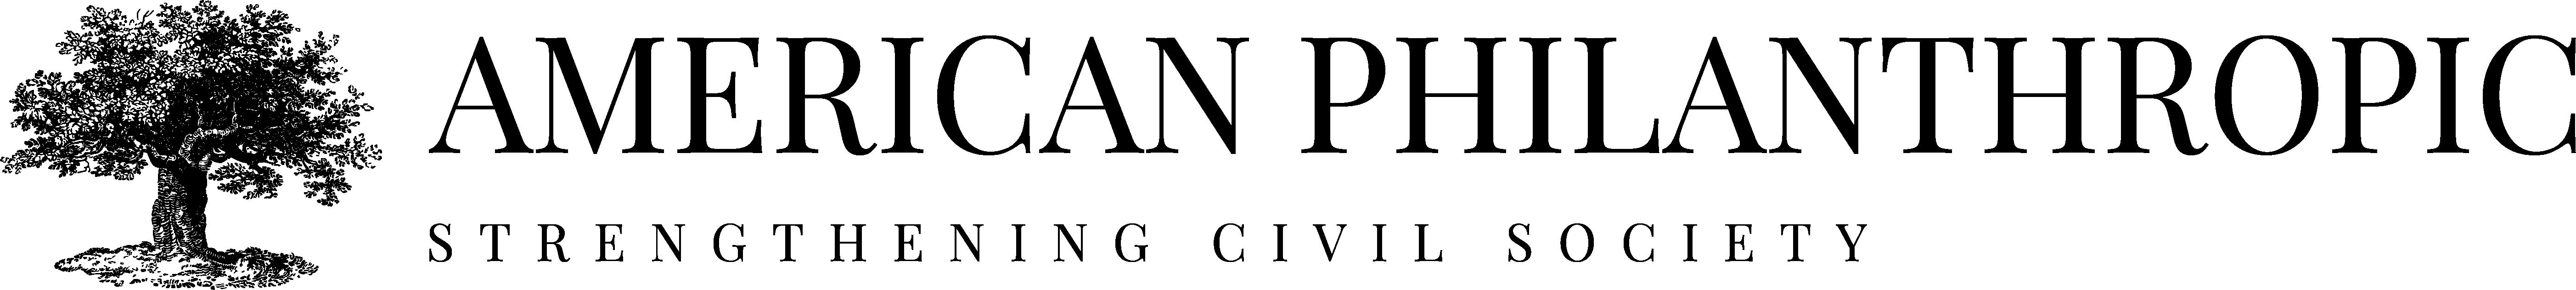 AP logo-left-tree